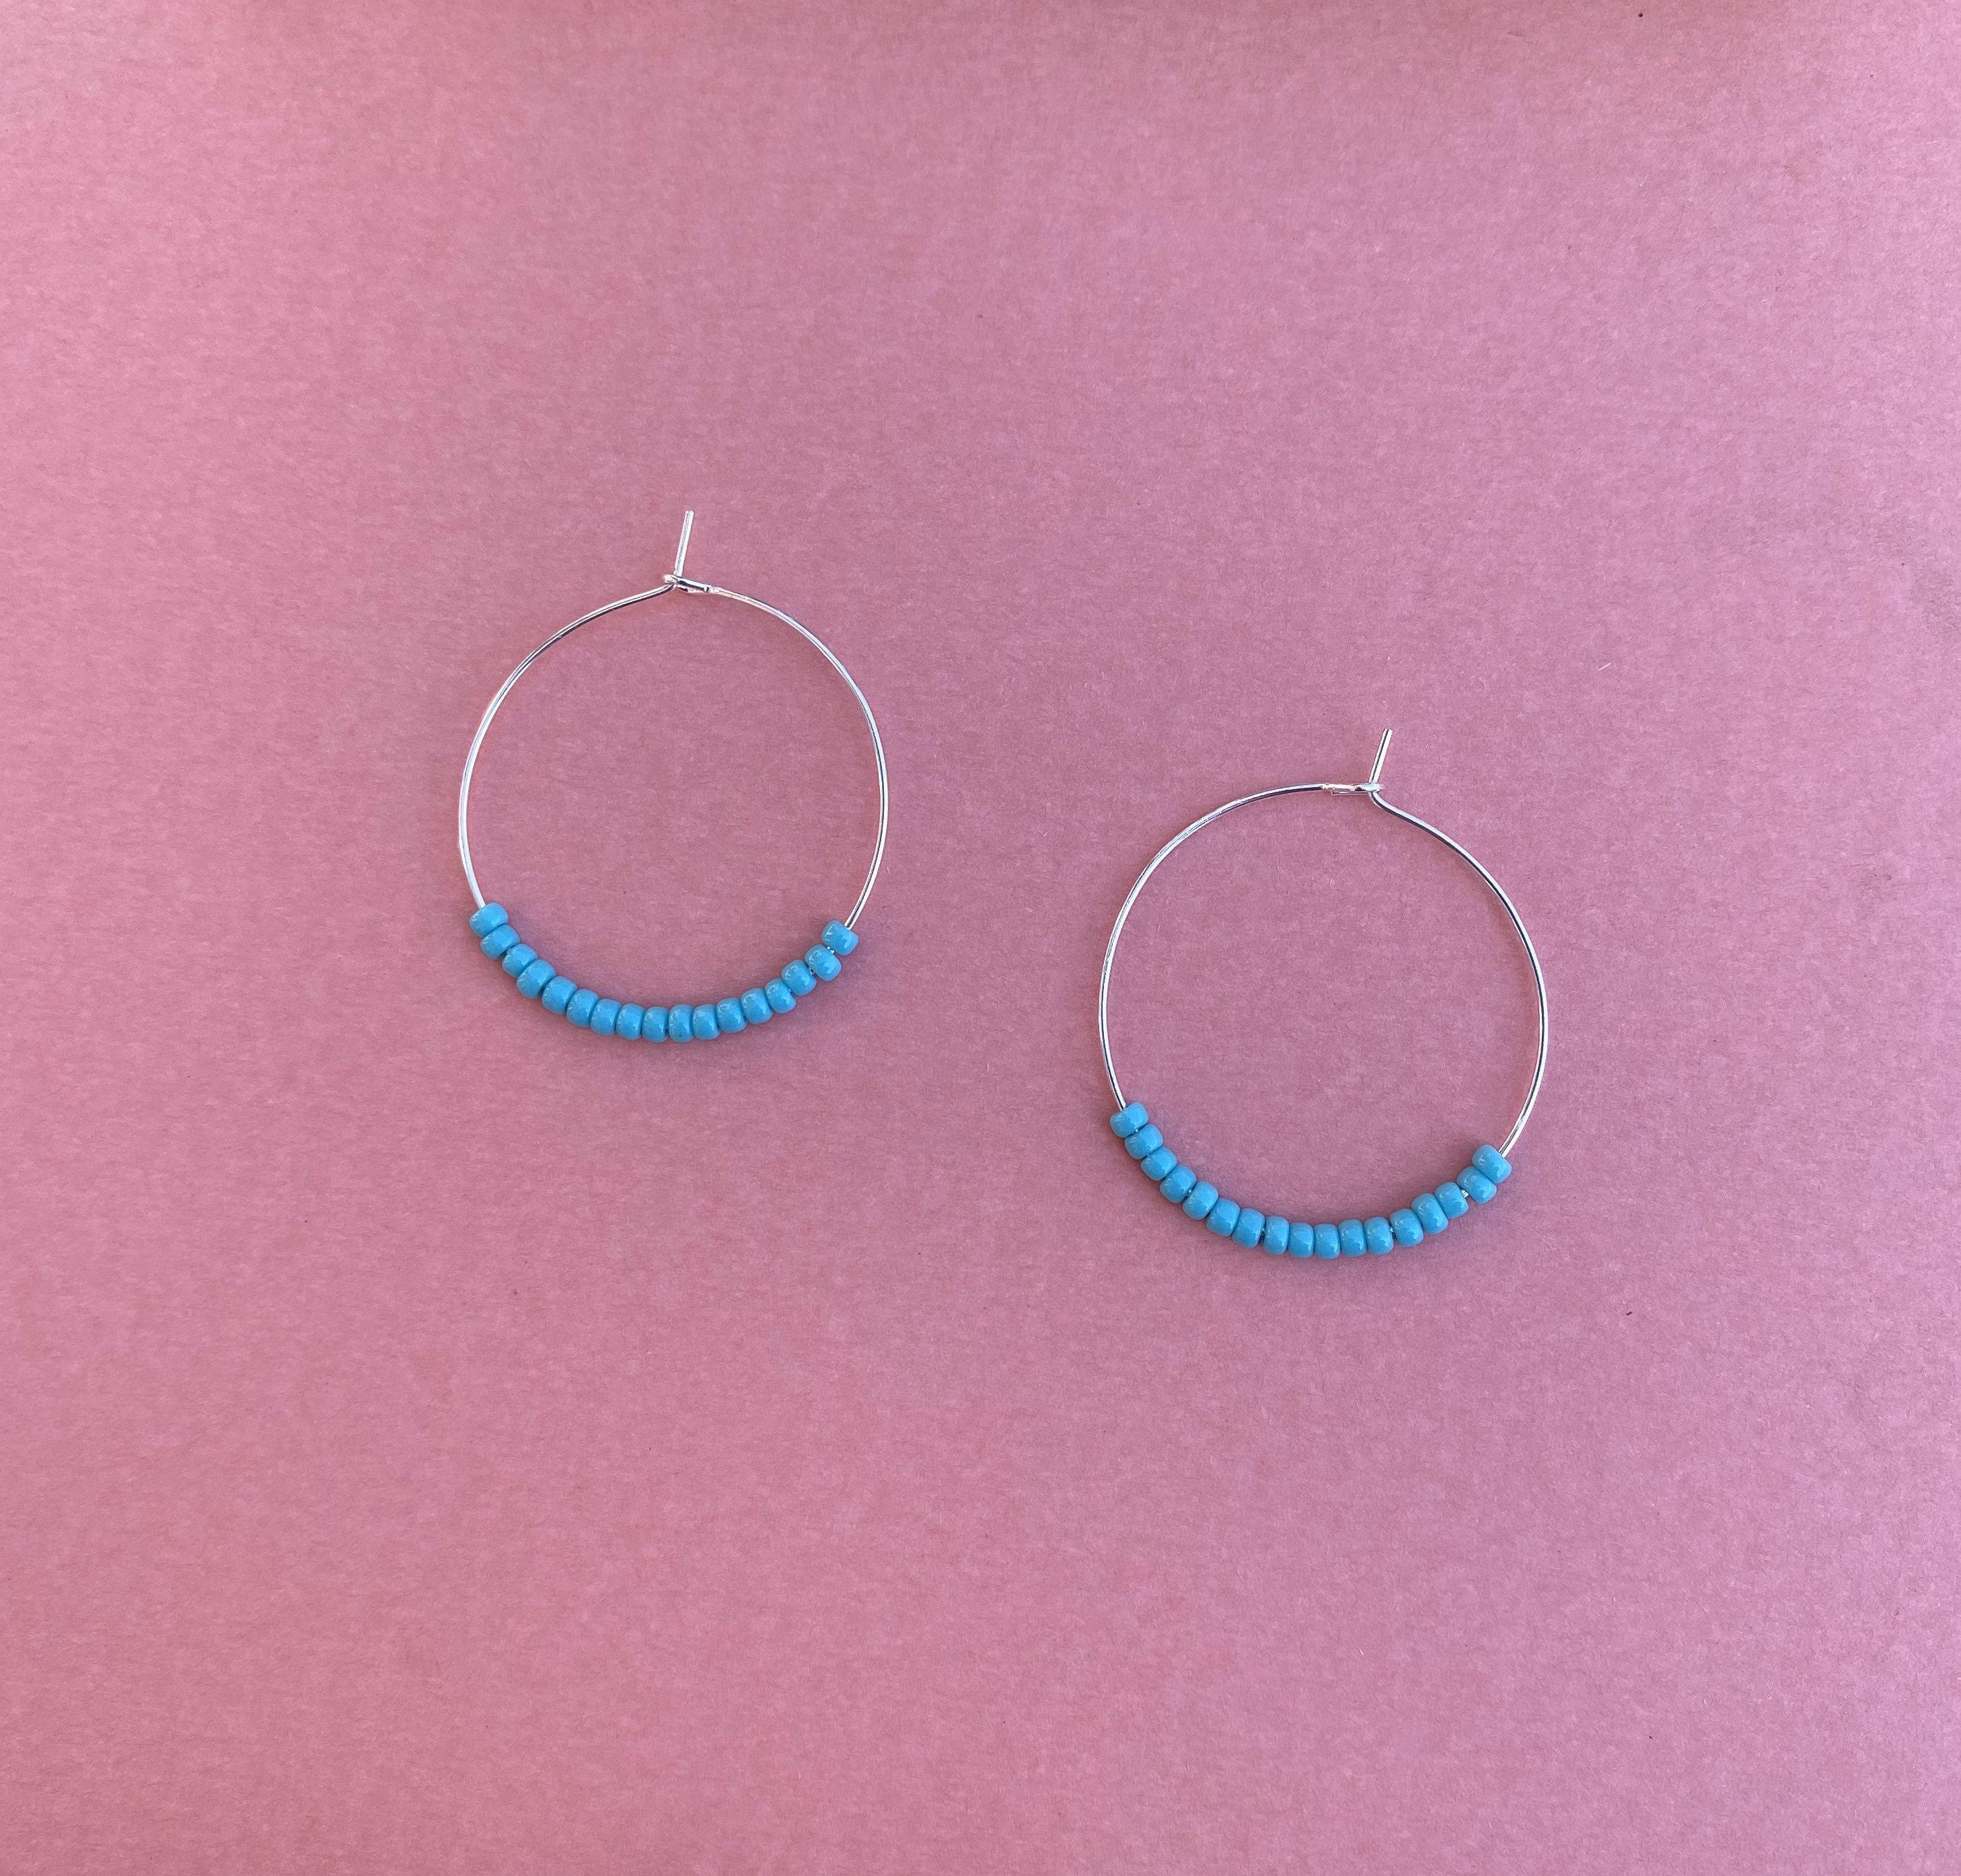 Turquoise Bead Earrings, Dainty Seed Earrings, Seed Bead Hoops, Beaded Earrings, Blue Beaded Jewelry, Turquoise Jewelry, Seed Bead Jewelry